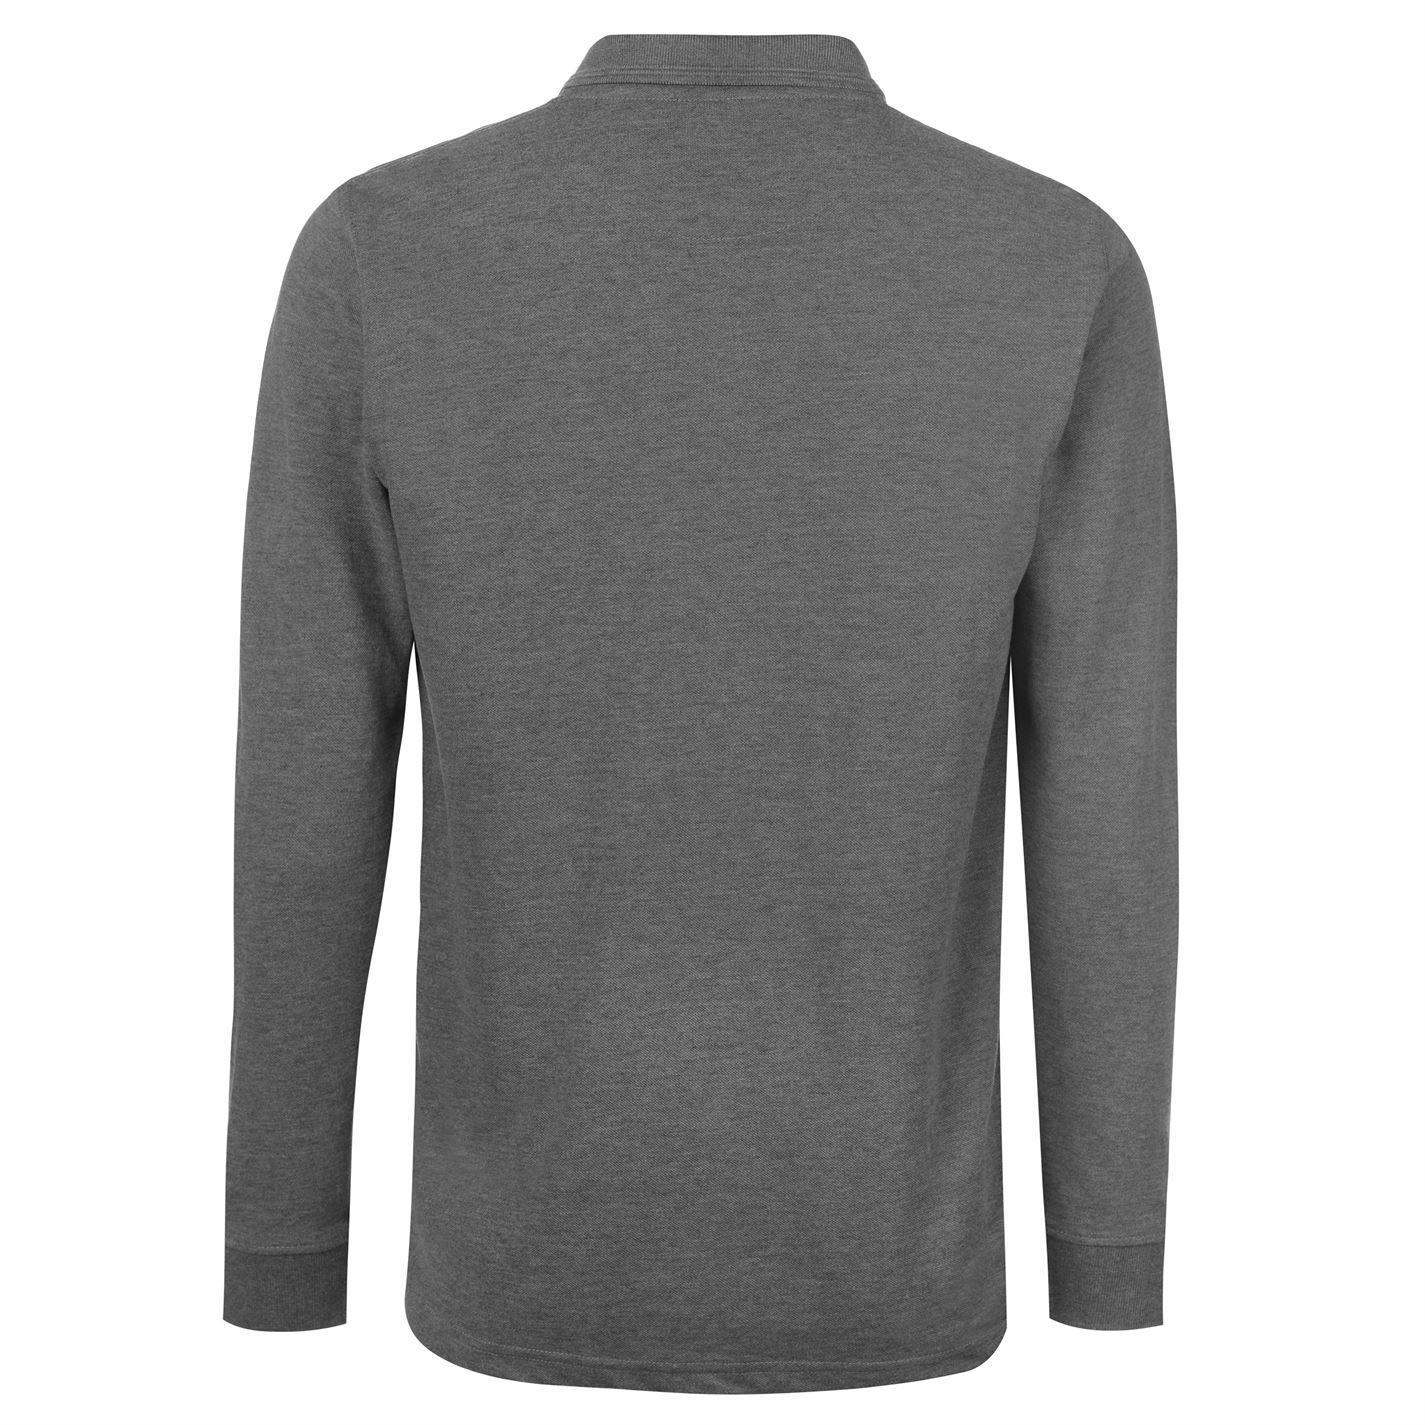 NEW-Pierre-Cardin-Mens-Long-Sleeve-Pure-Cotton-Polo-Shirt-Size-S-M-L-XL-XXL thumbnail 16